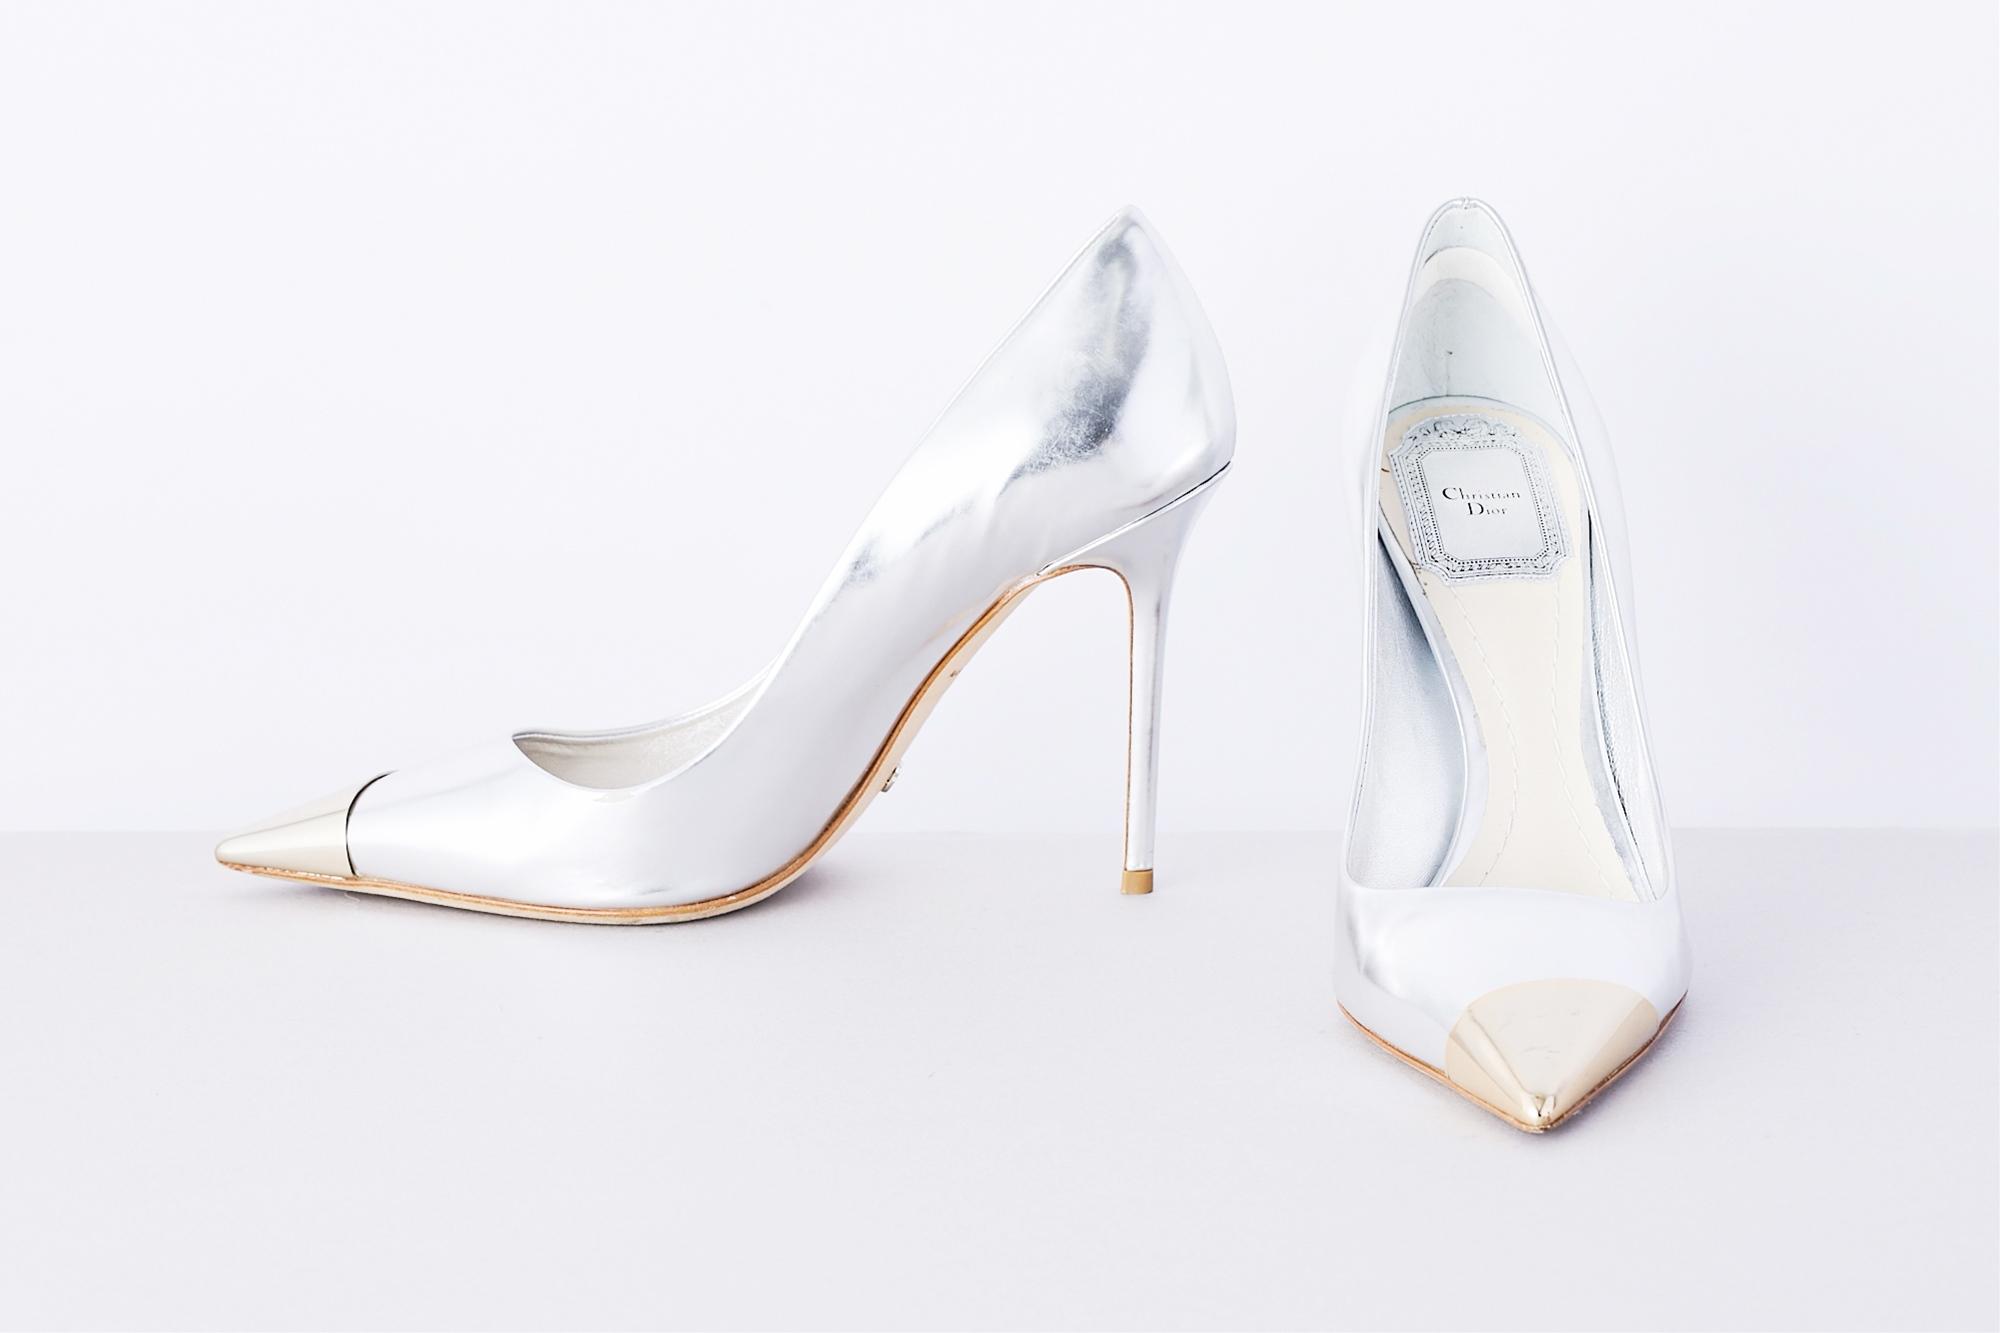 SH505718 Christian Dior 36.5